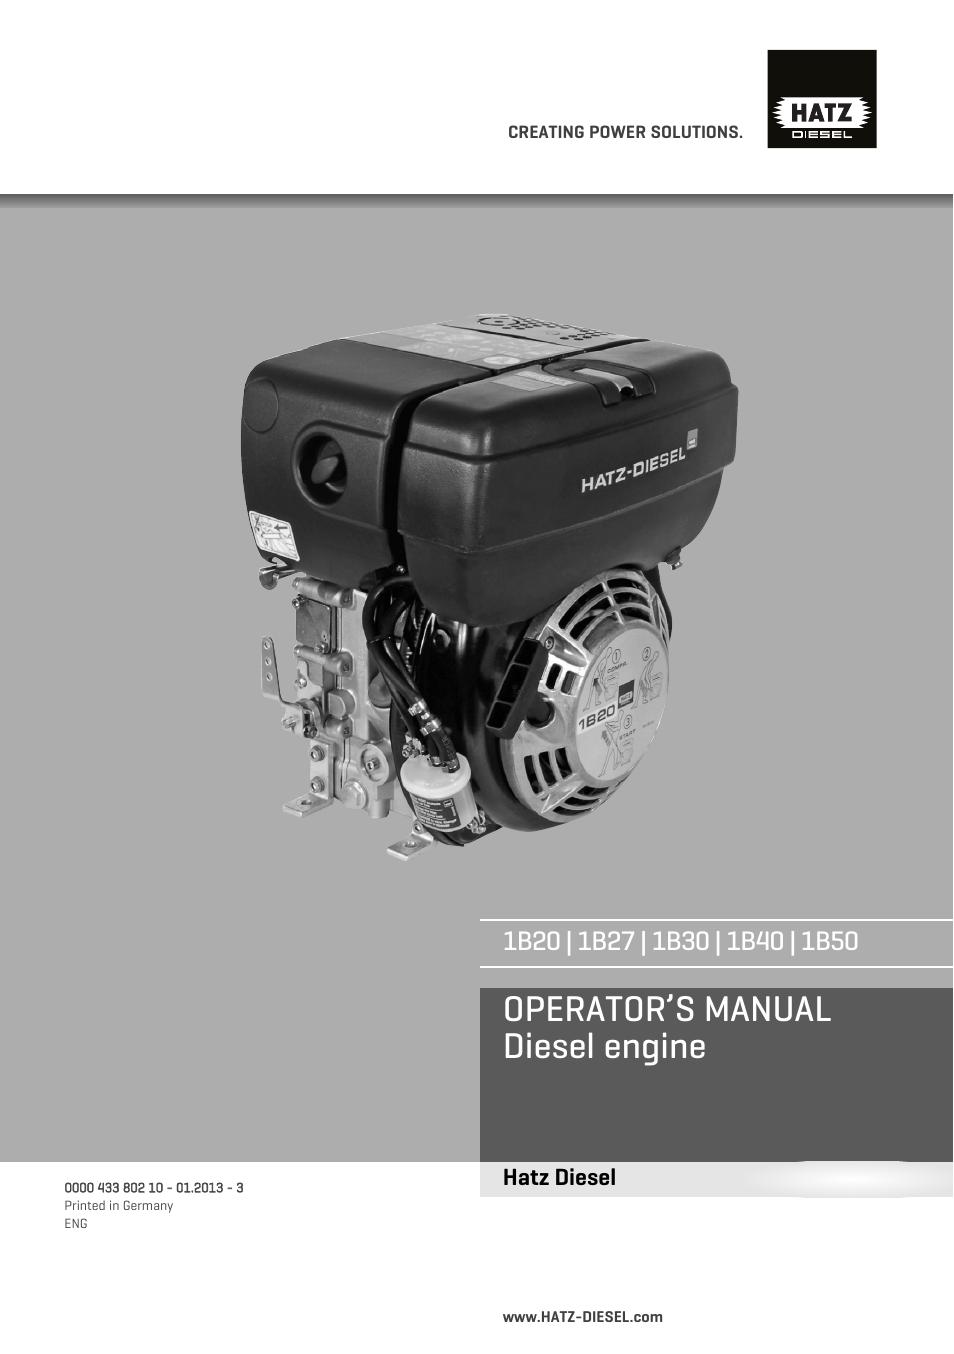 HATZ Diesel 1B 50 User Manual | 88 pages | Also for: 1B 40, 1B 30, 1B 27,  1B 20